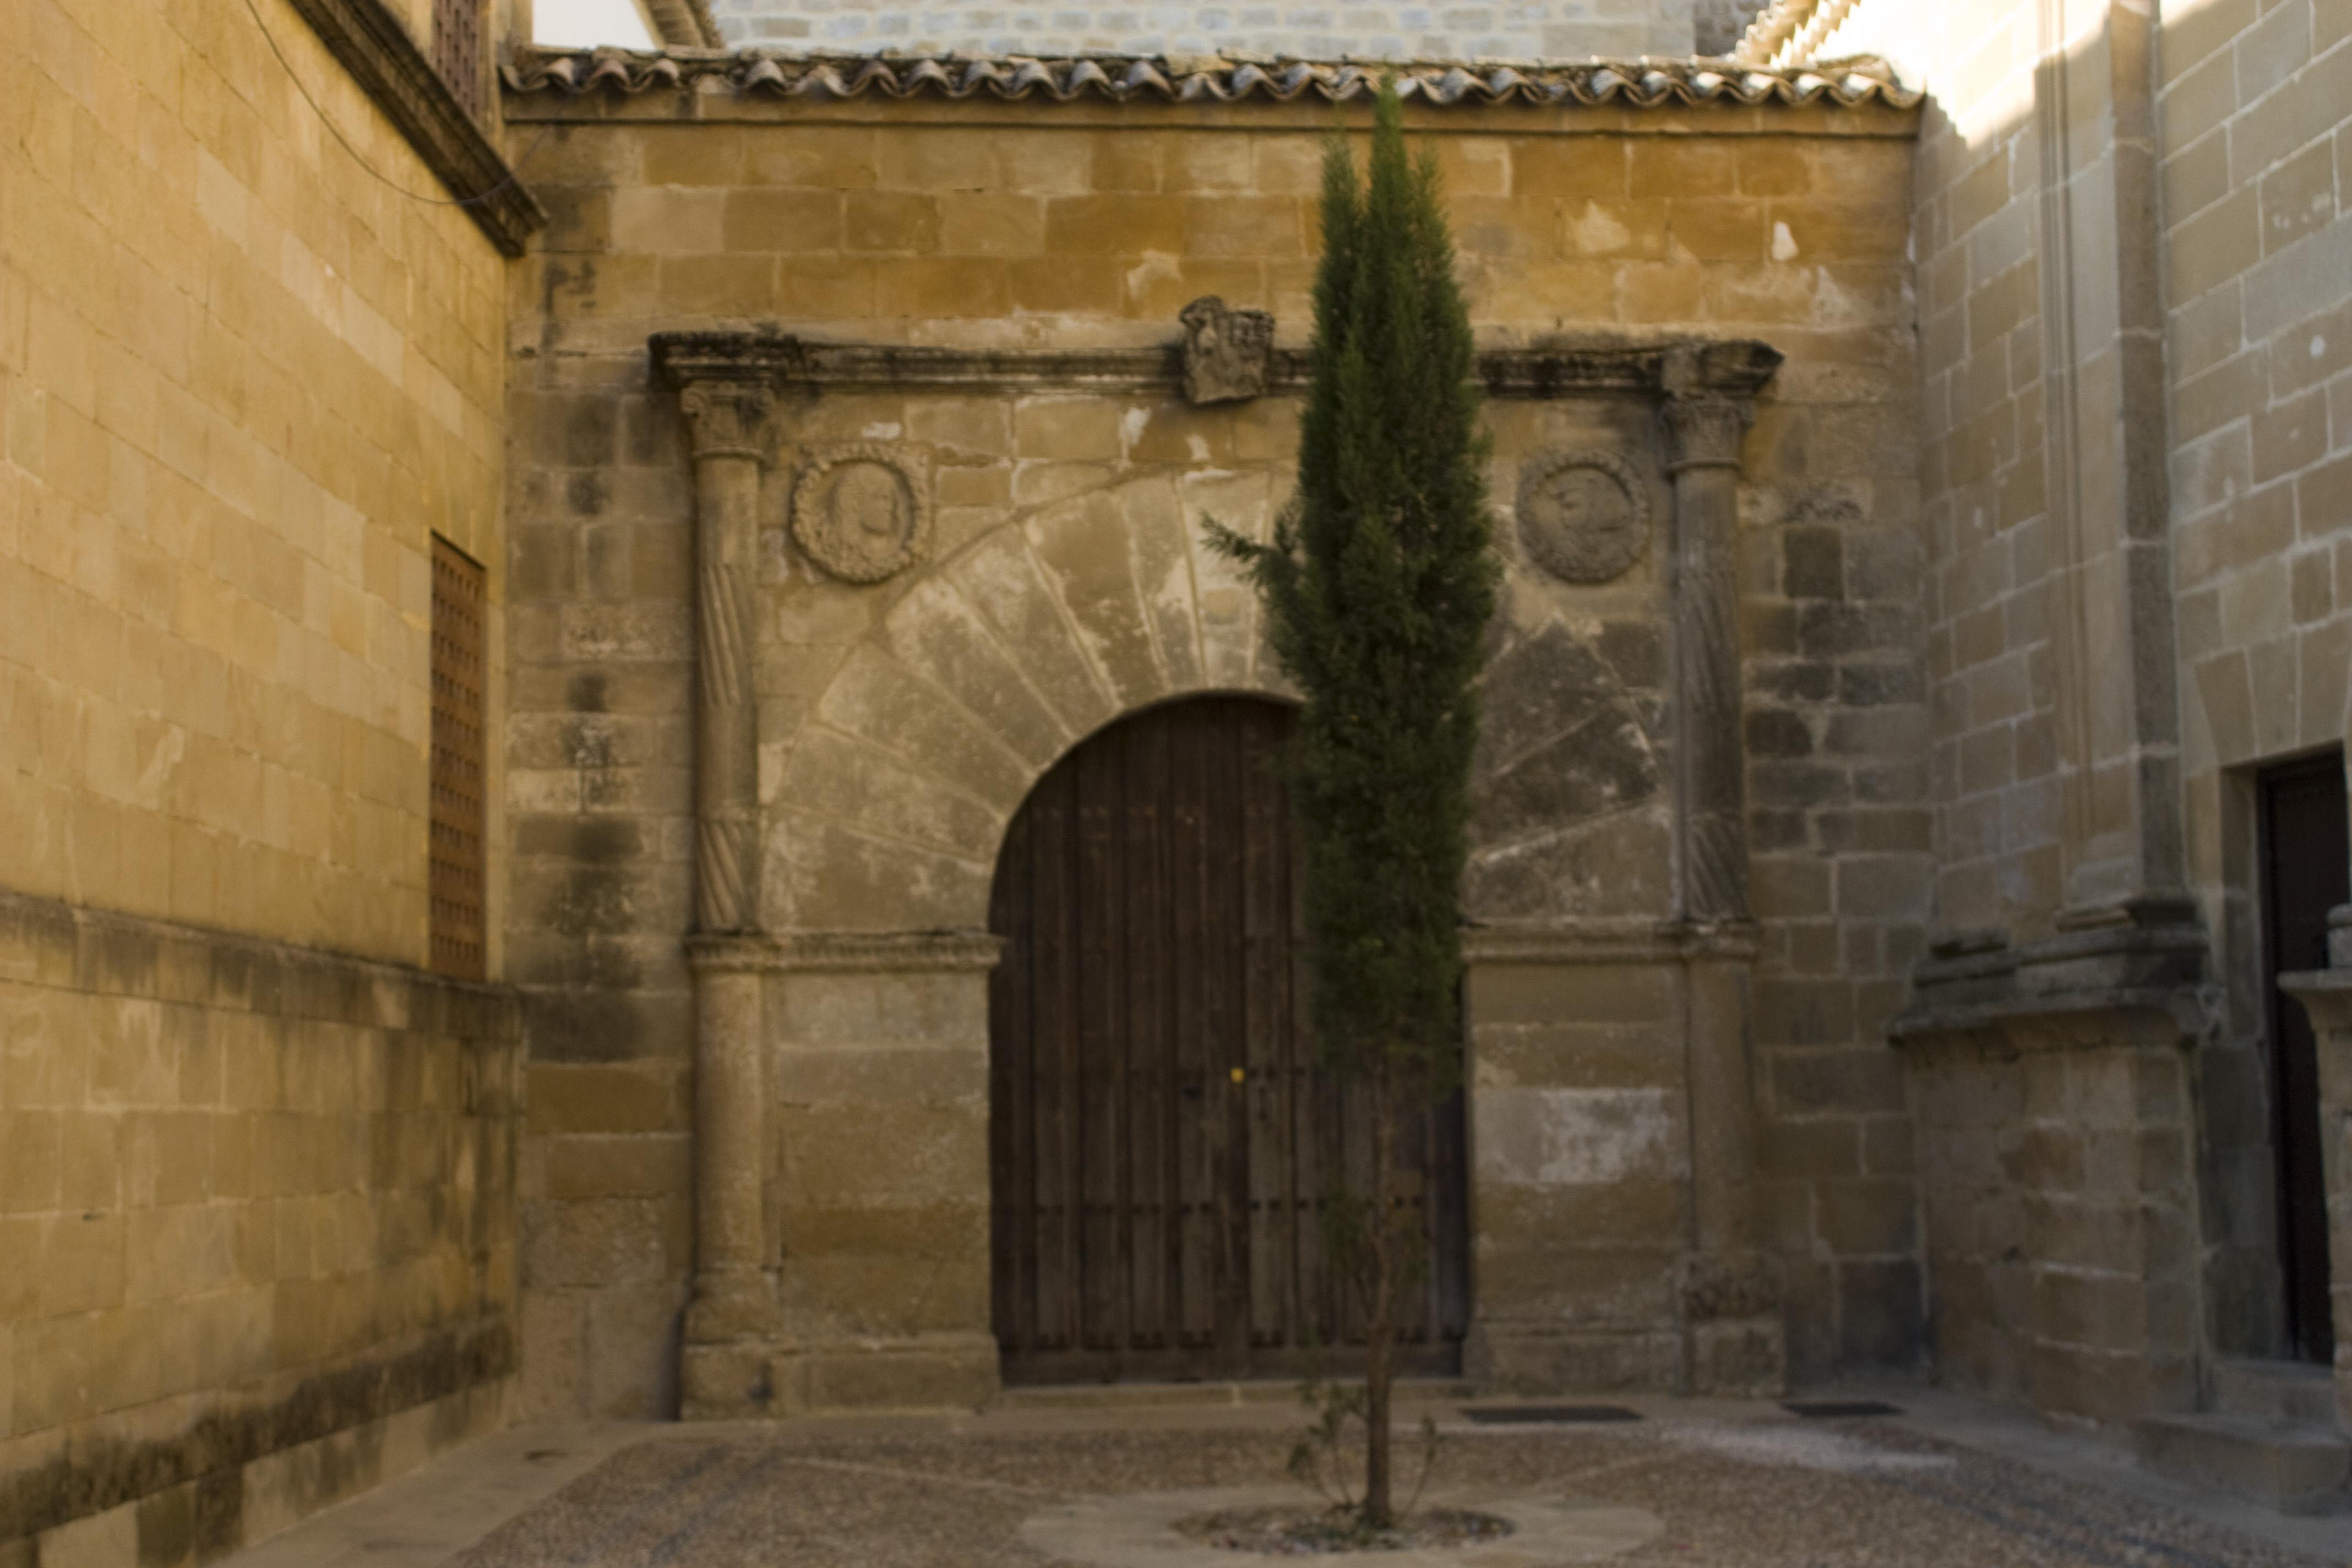 File Beda Puerta De La Carcel Del Obispo 20110919 09858